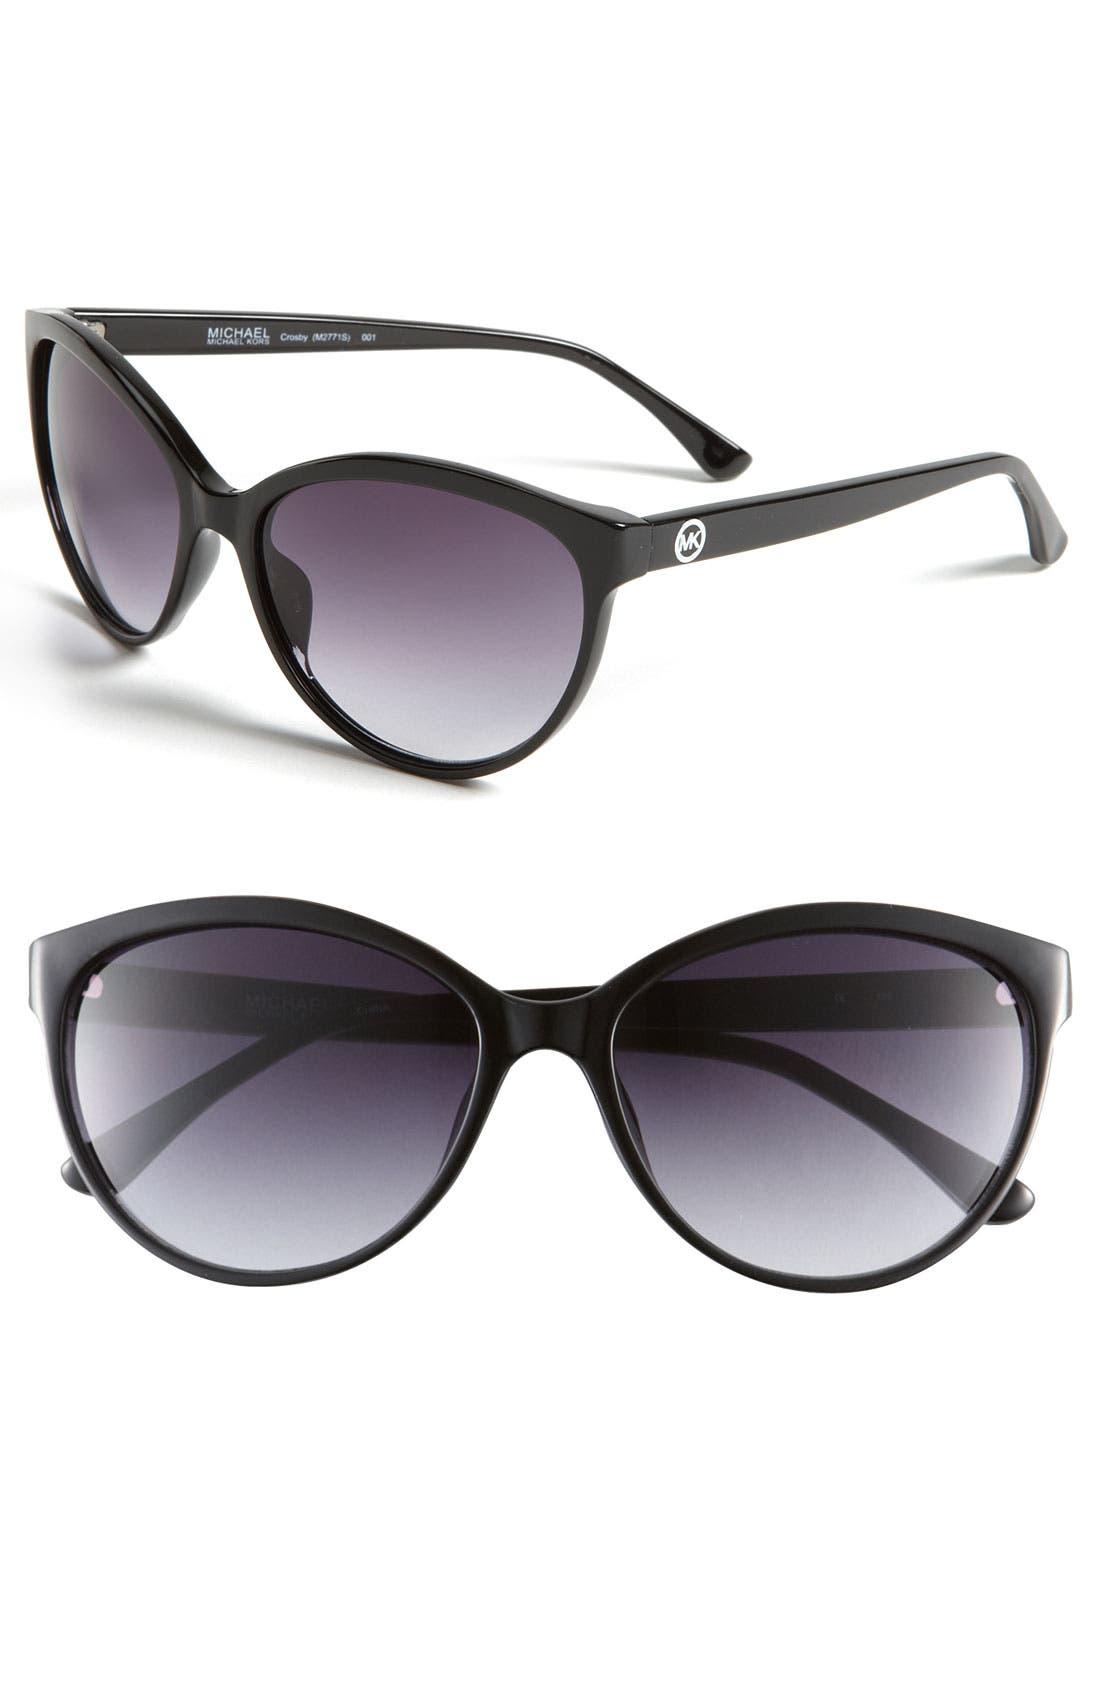 Main Image - MICHAEL Michael Kors 58mm Cat's Eye Sunglasses